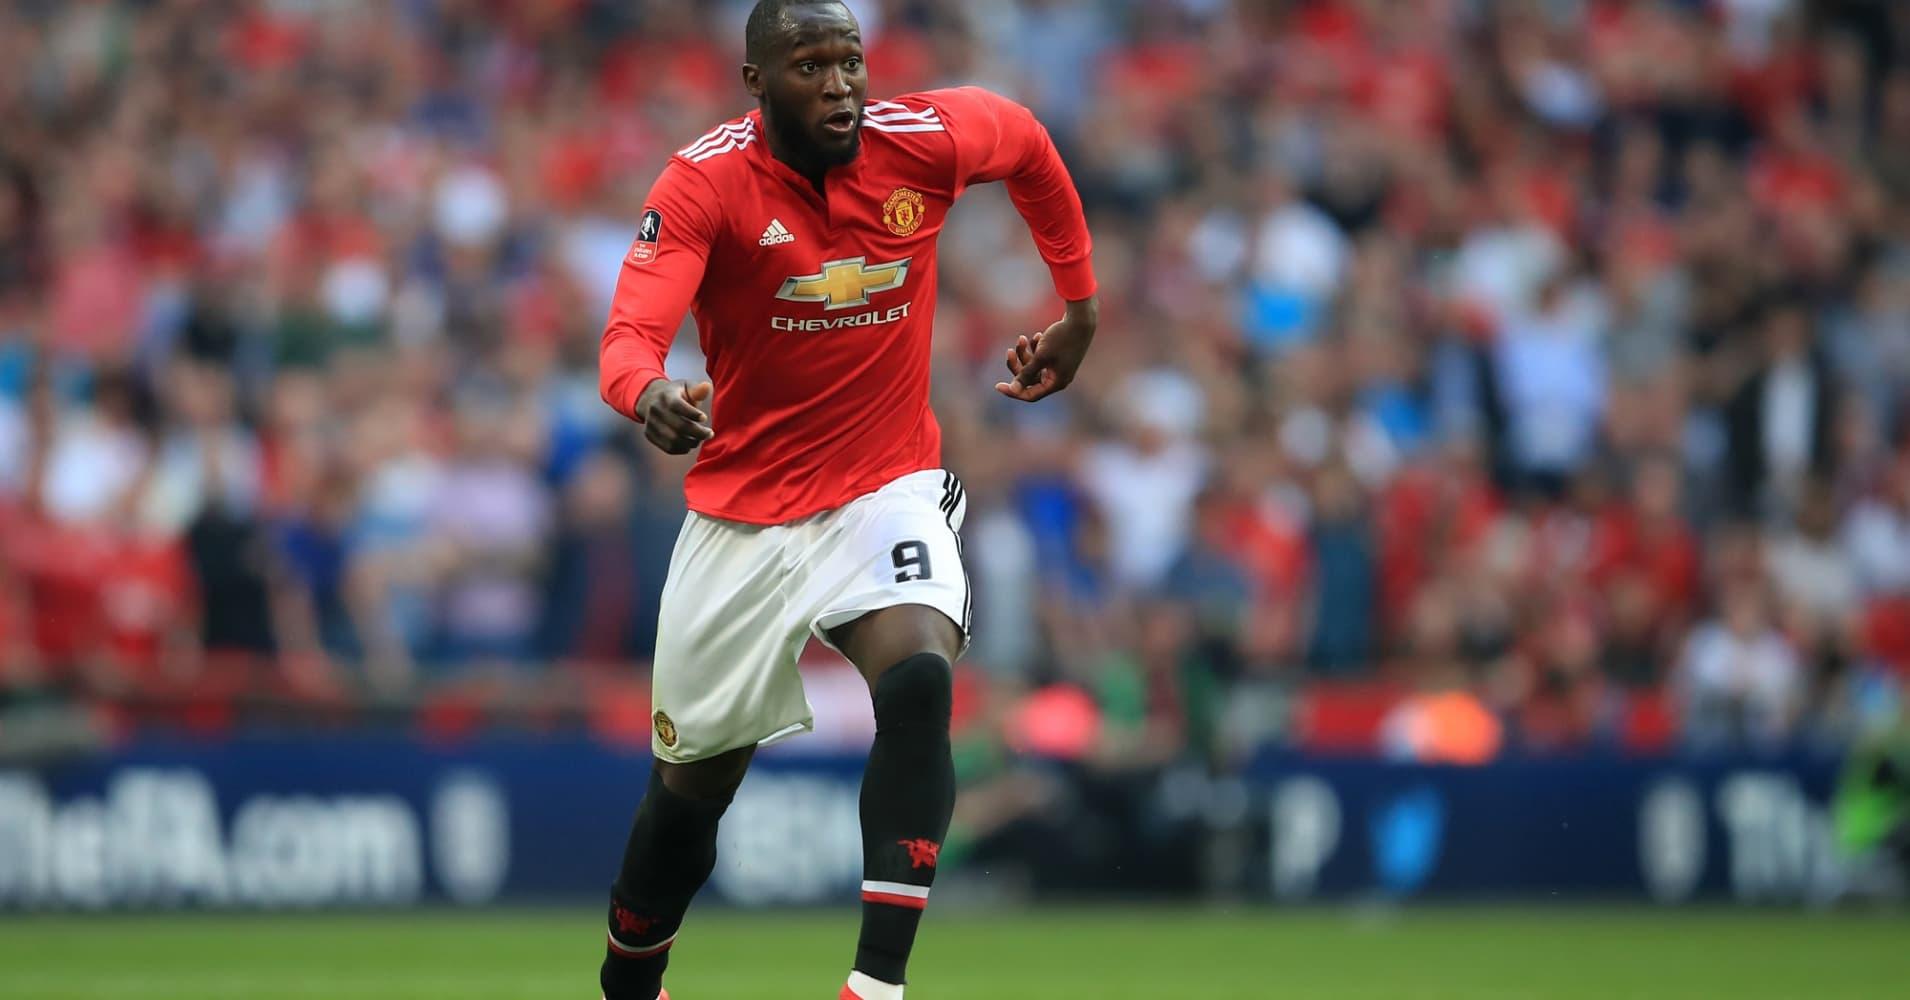 Soccer star Romelu Lukaku says he's motivated by having ...